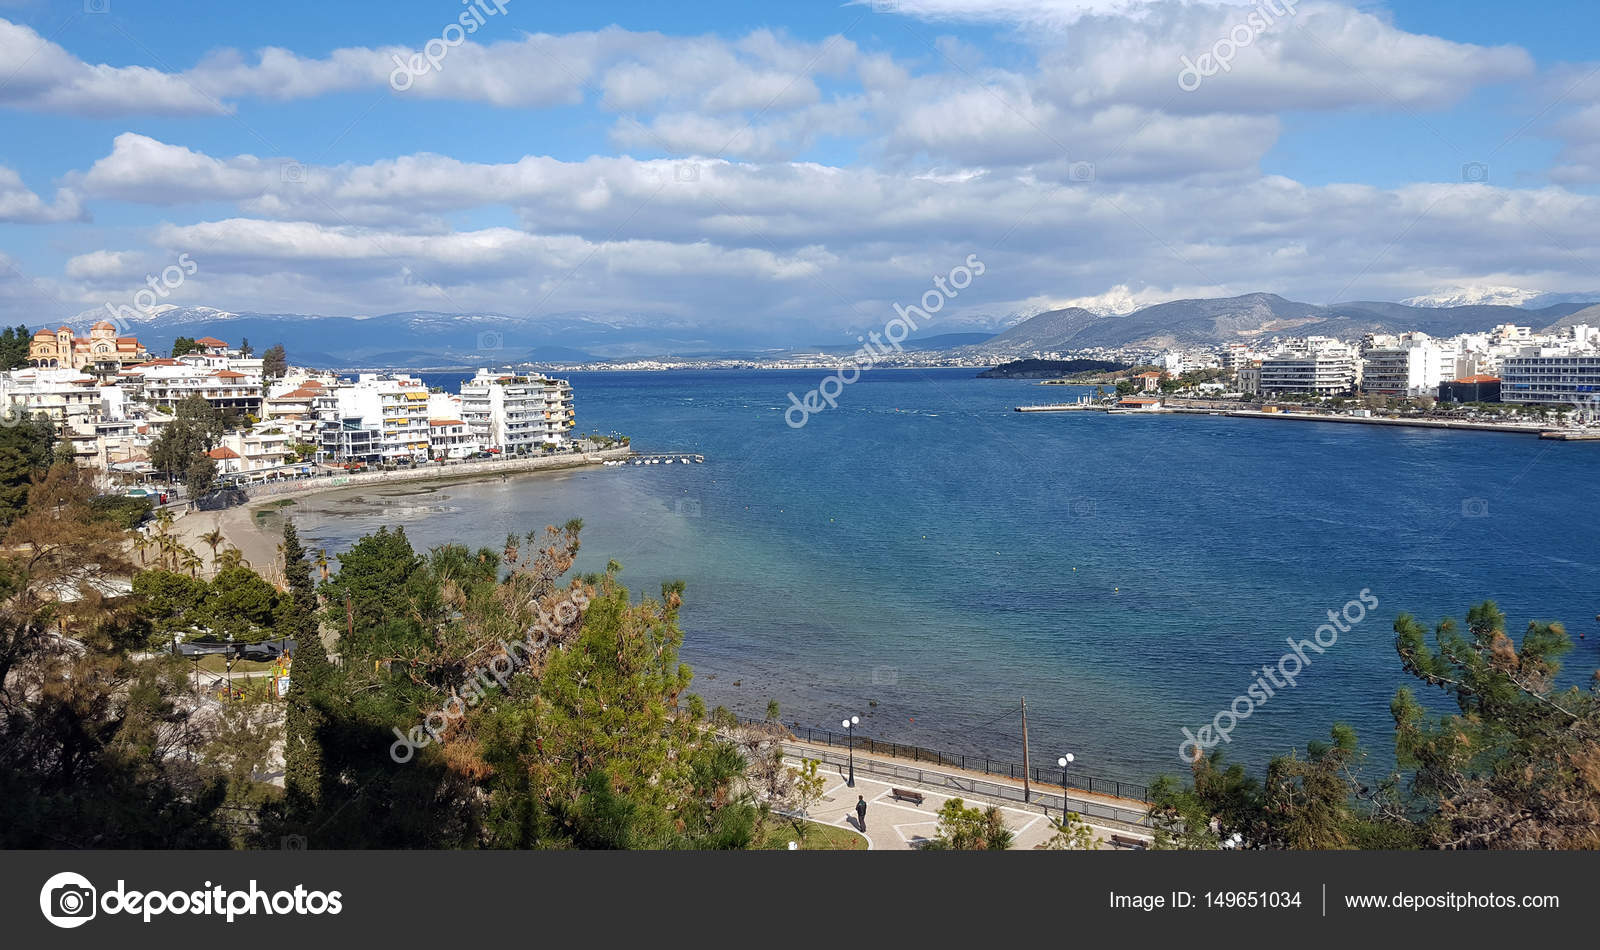 9b8871c5b90 Η Χαλκίδα, Εύβοια, Ελλάδα — Φωτογραφία Αρχείου © roxanabalint #149651034